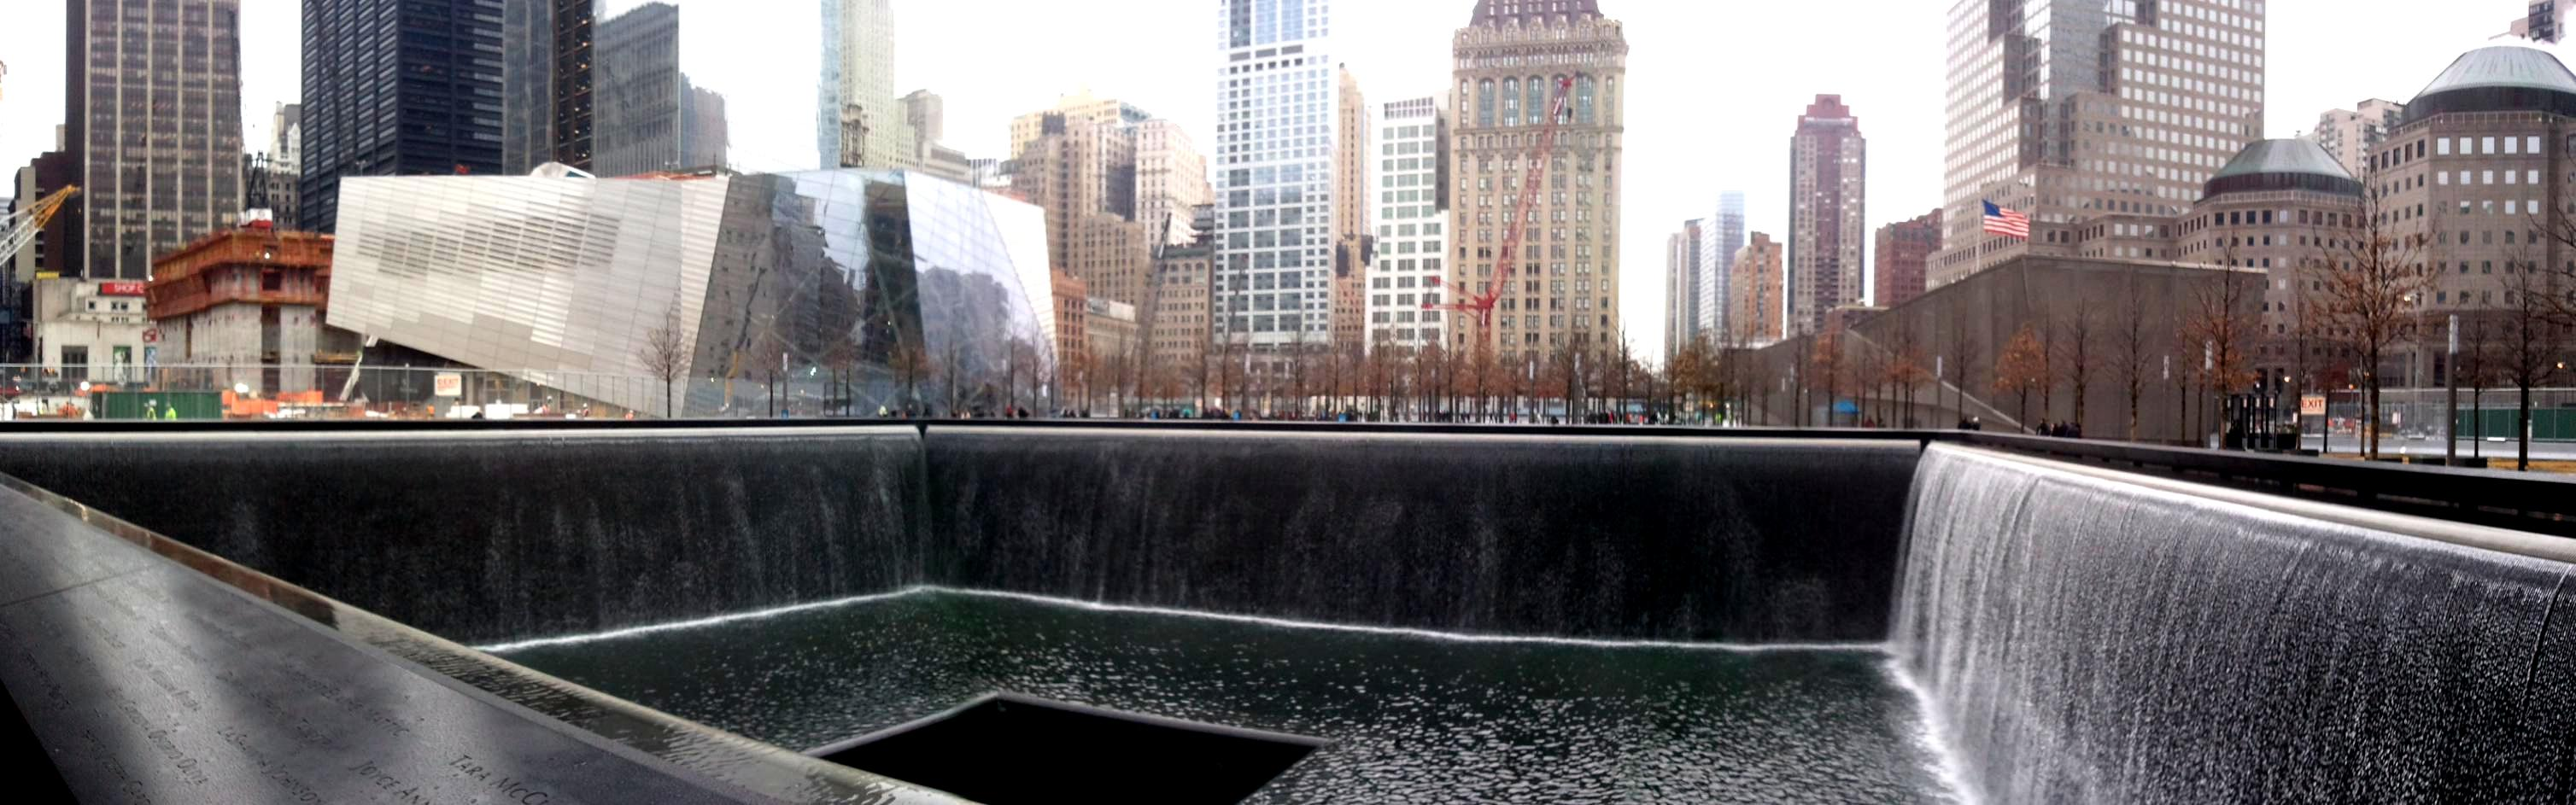 2012-09-10-NYCmemorialfev2012.jpg